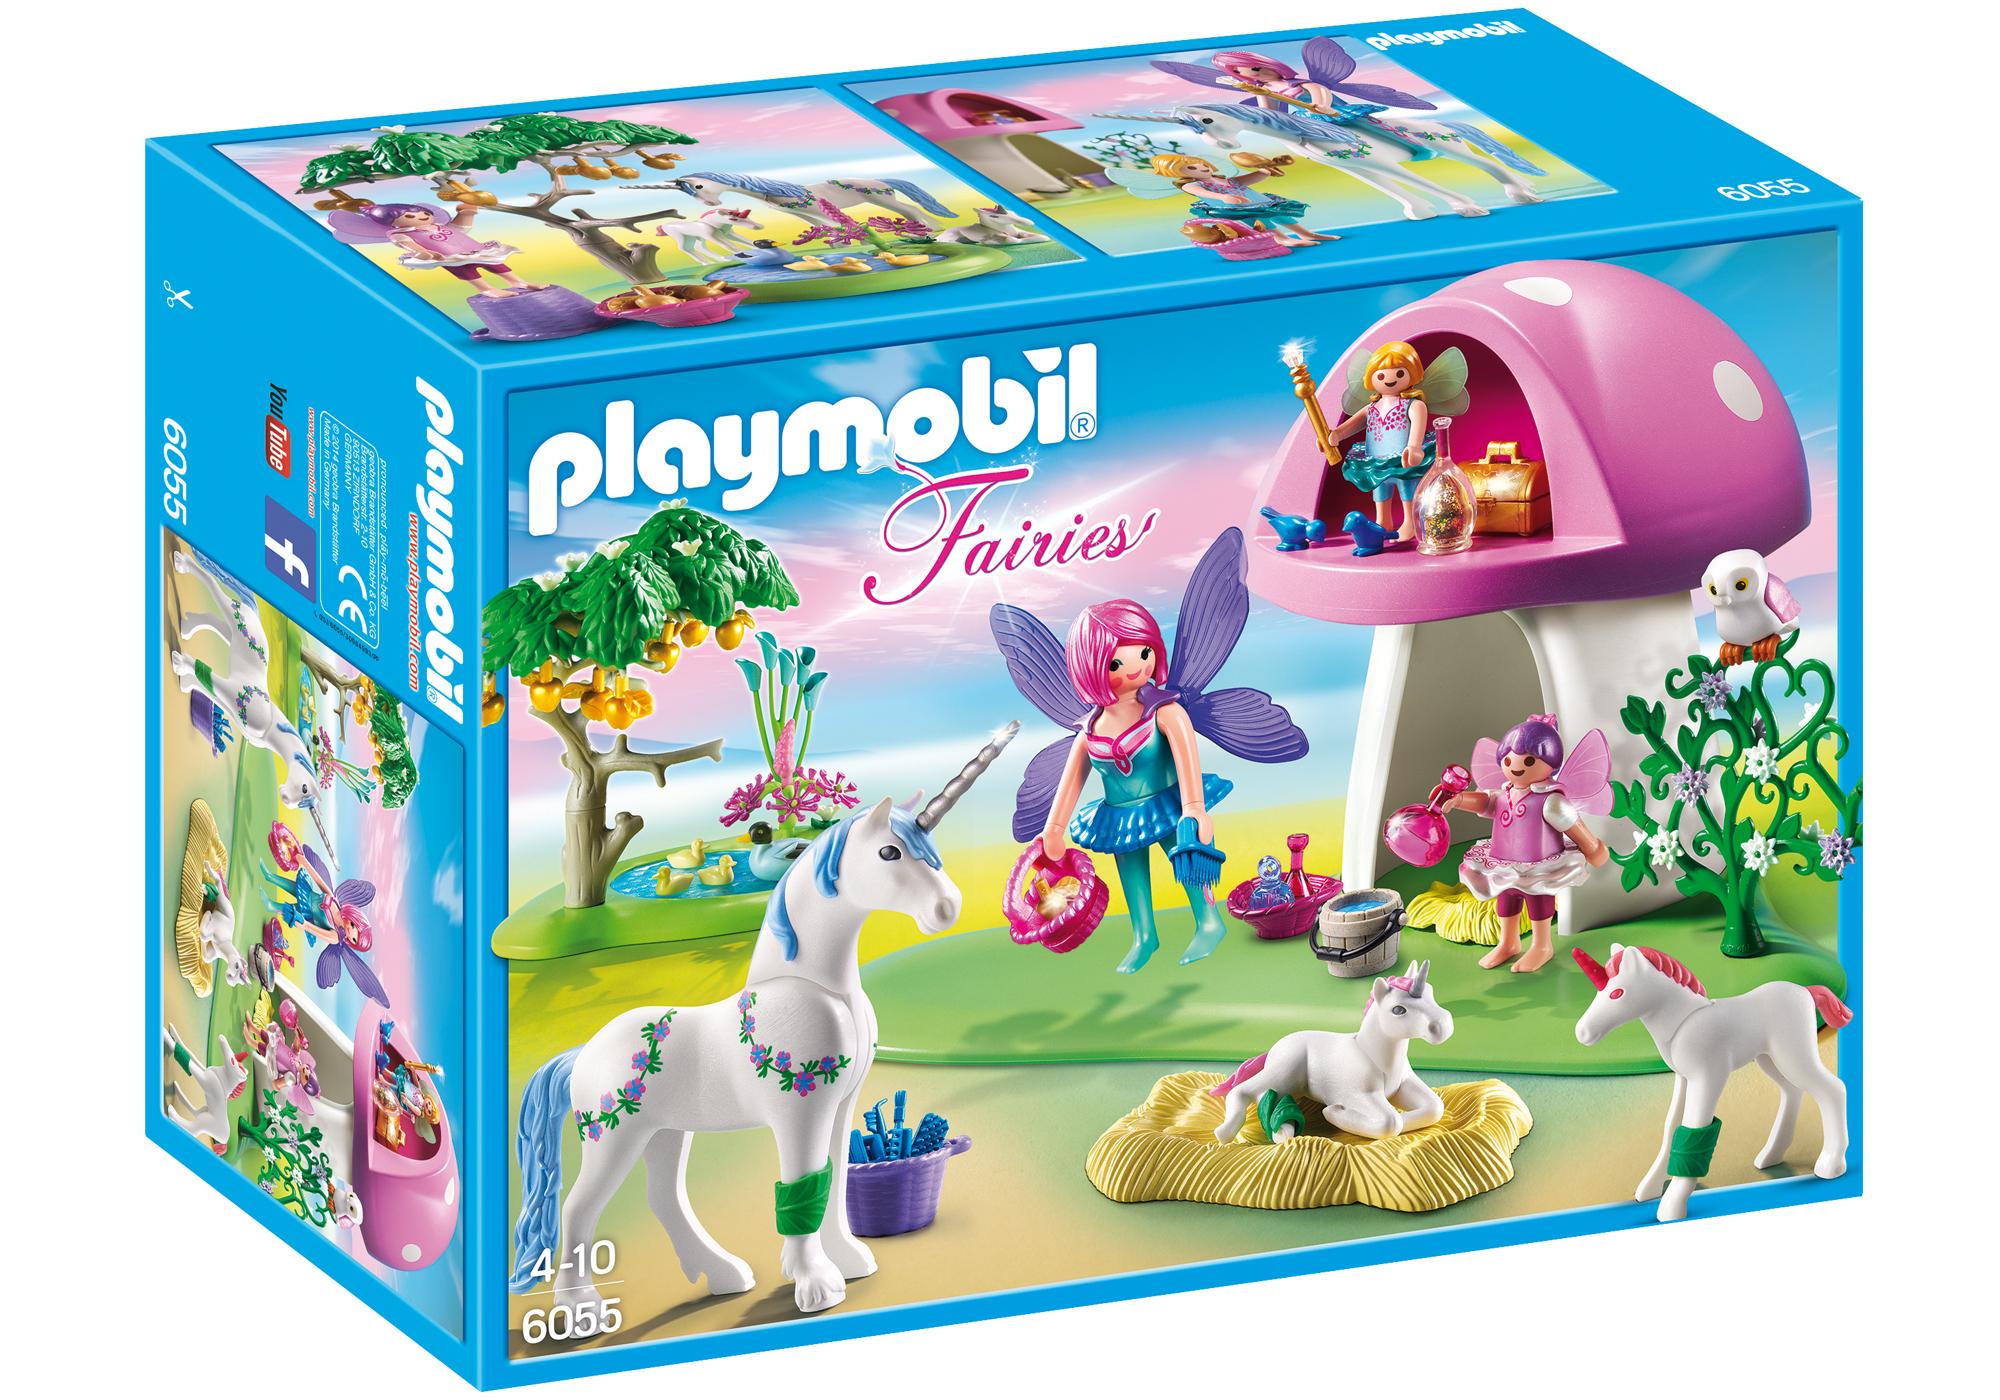 http://media.playmobil.com/i/playmobil/6055_product_box_front